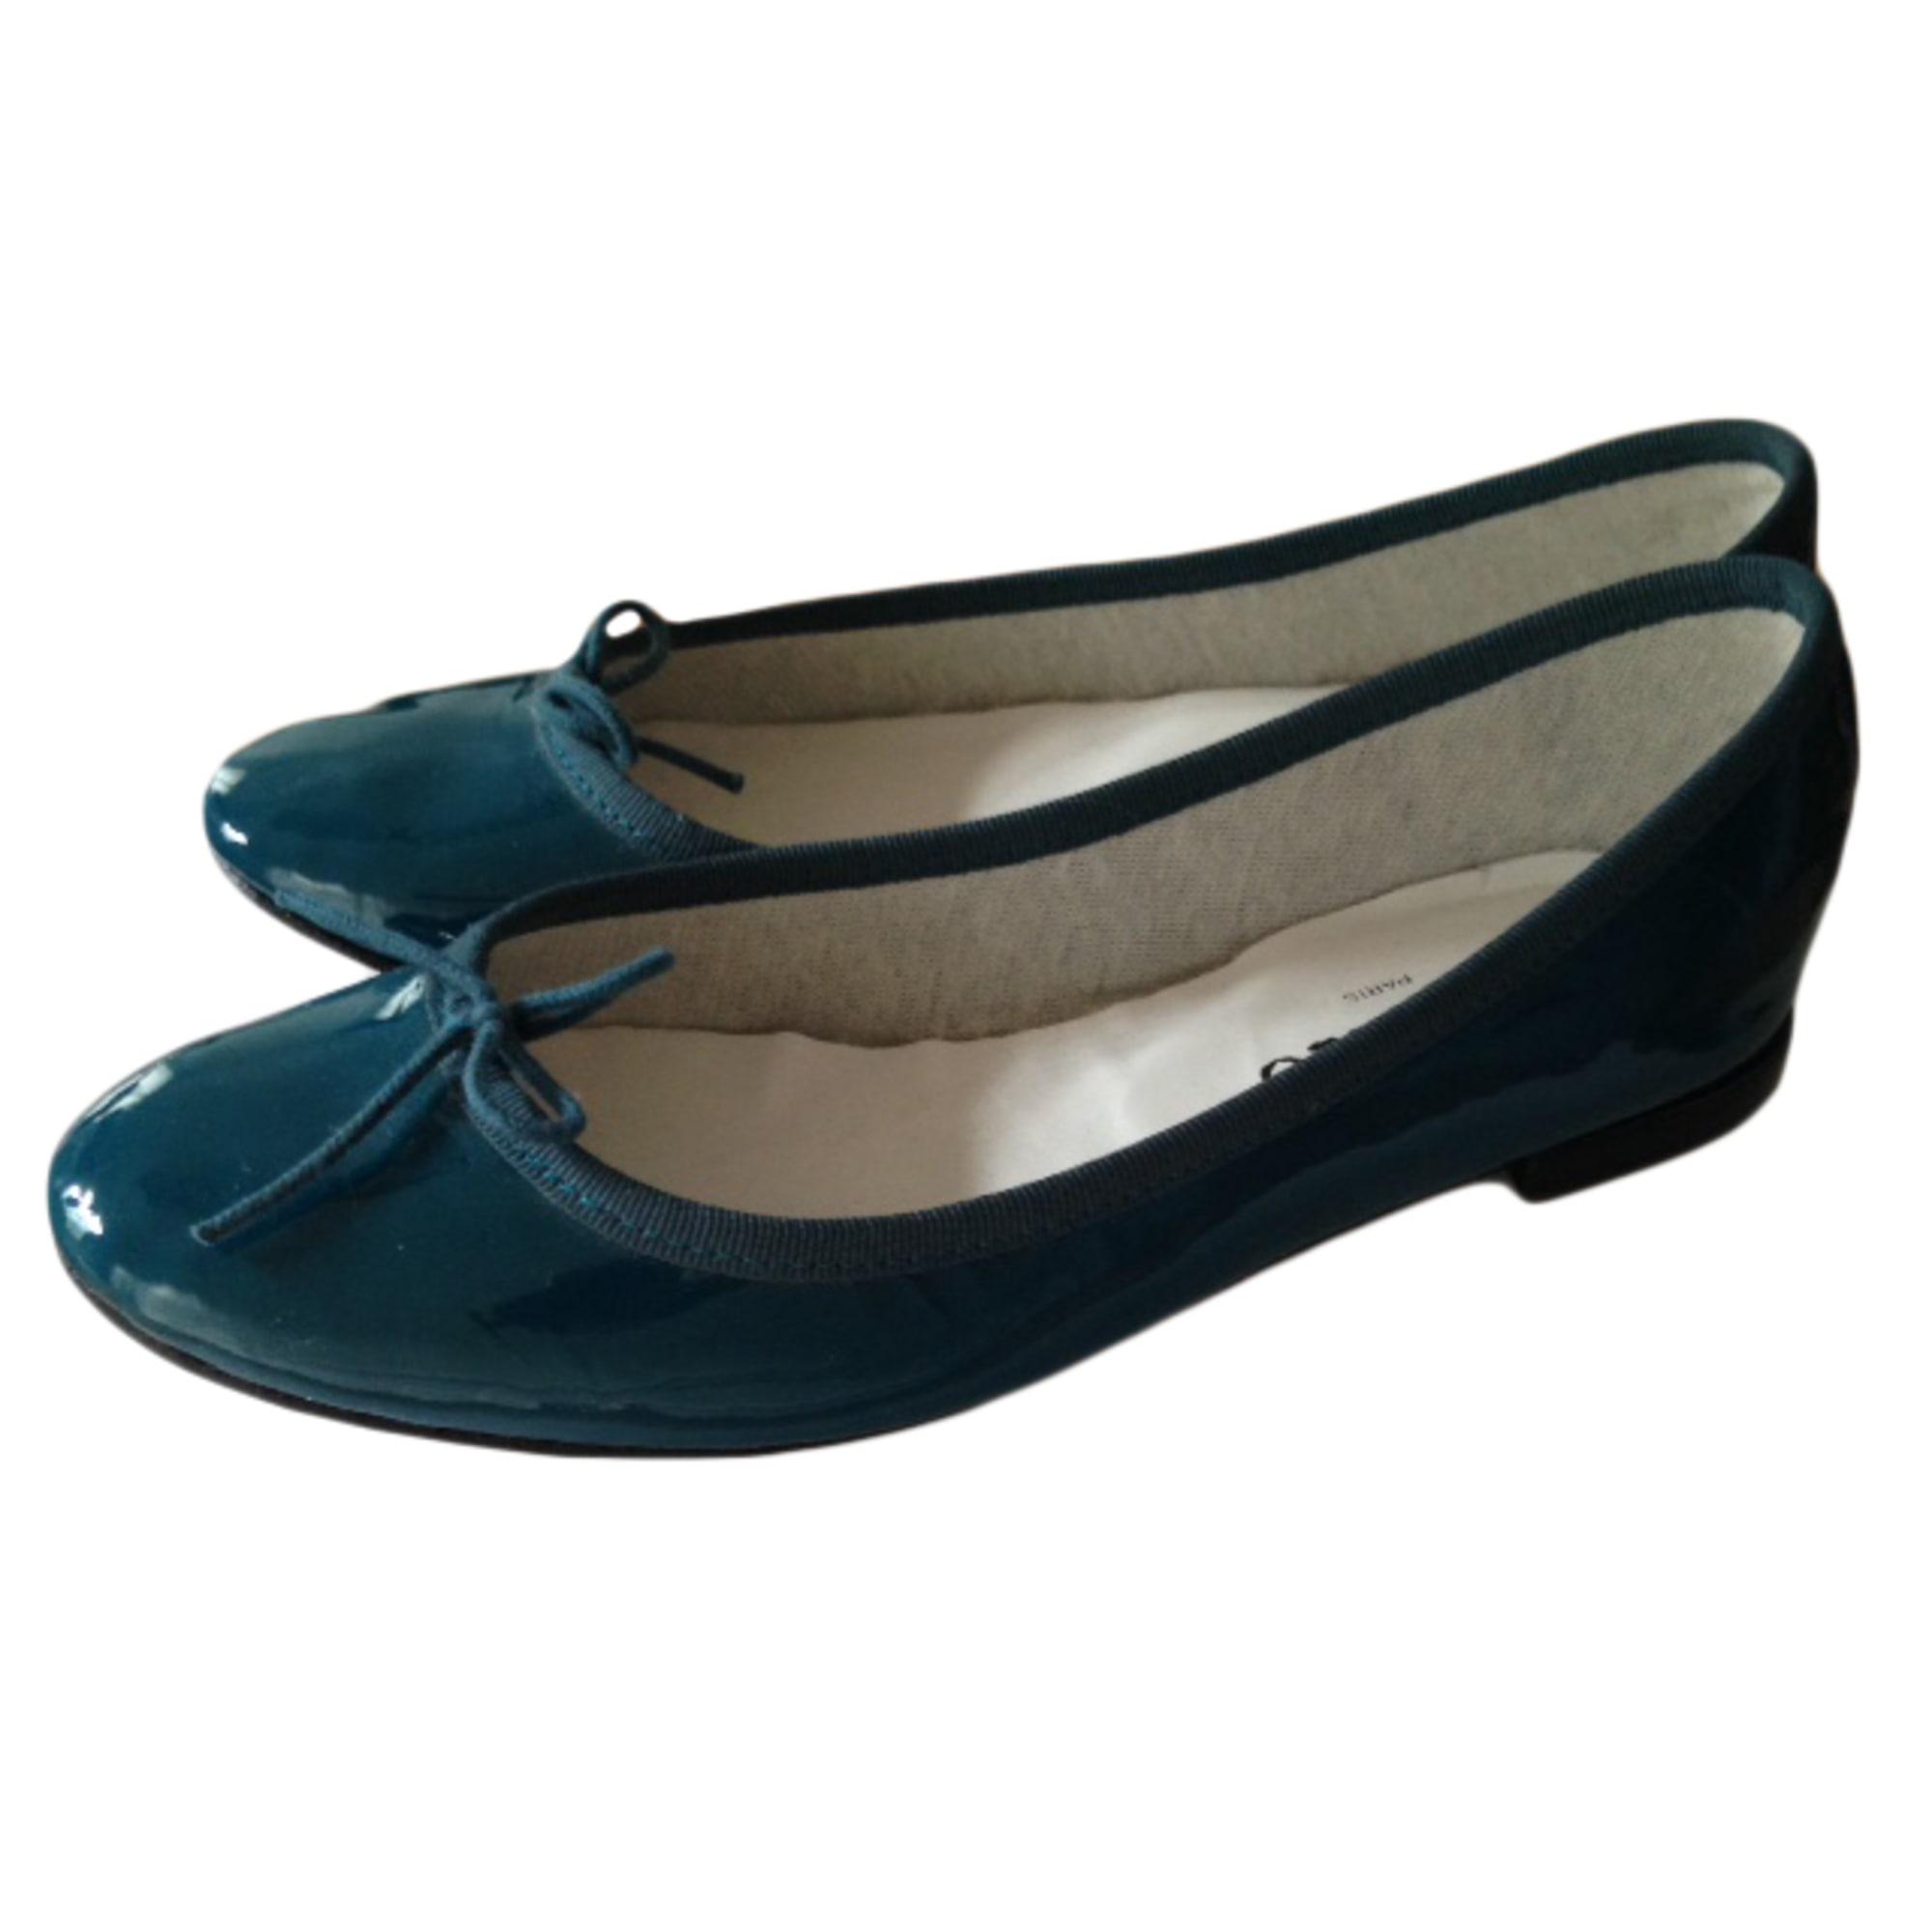 7585deeb23 Ballerines REPETTO Bleu, bleu marine, bleu turquoise